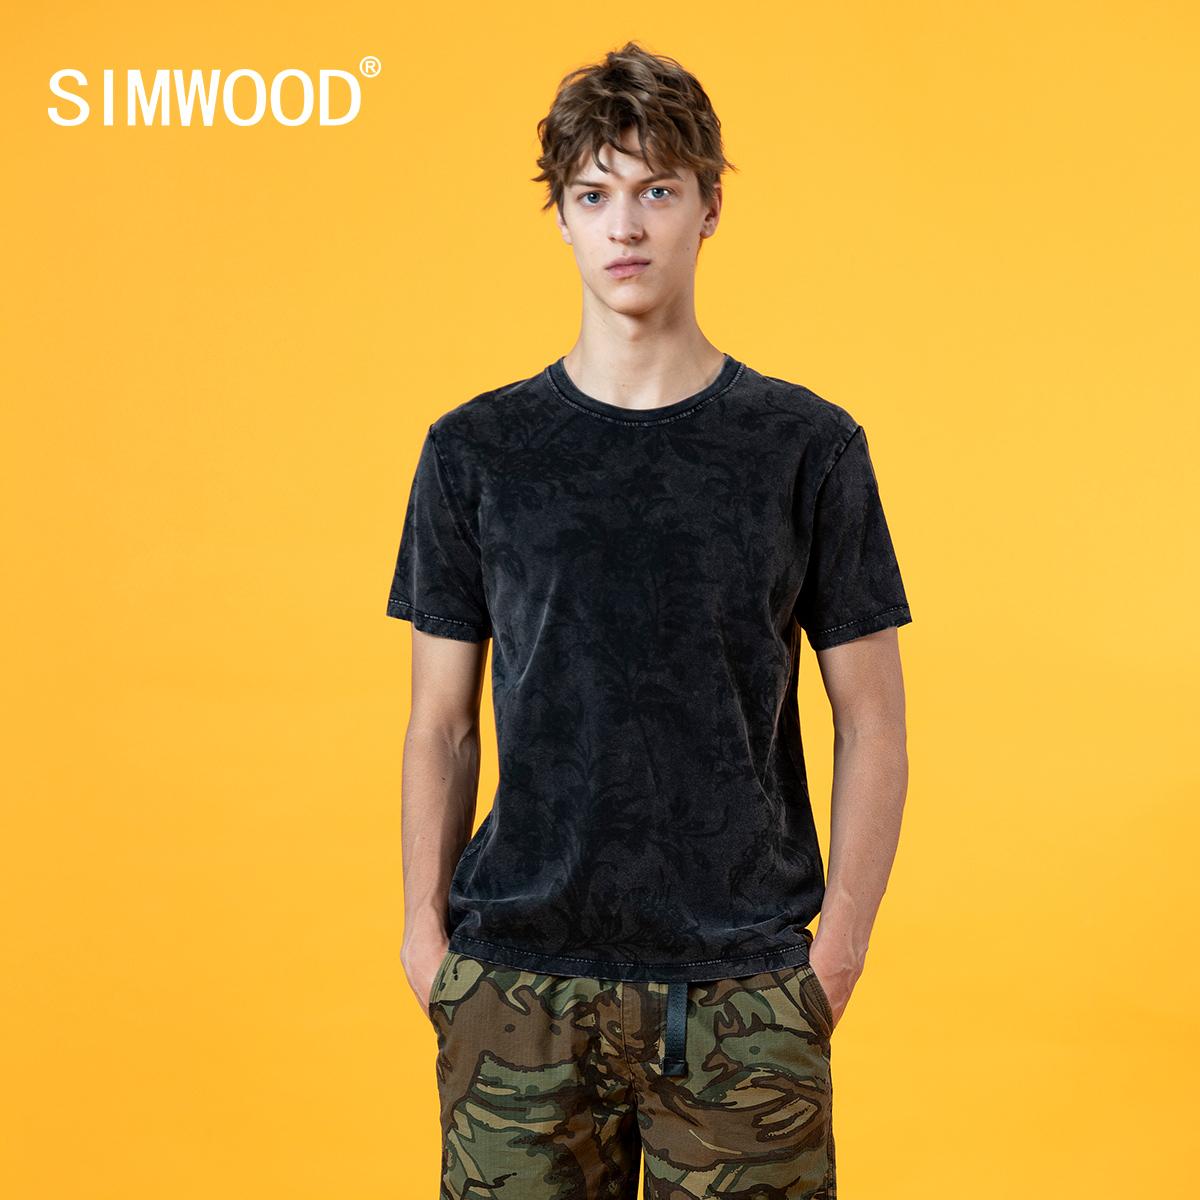 SIMWOOD 2020 summer tie dye t shirts 210g thick vintage t-shirt men snowwash floral print 100% cotton tshirt short sleeve tees